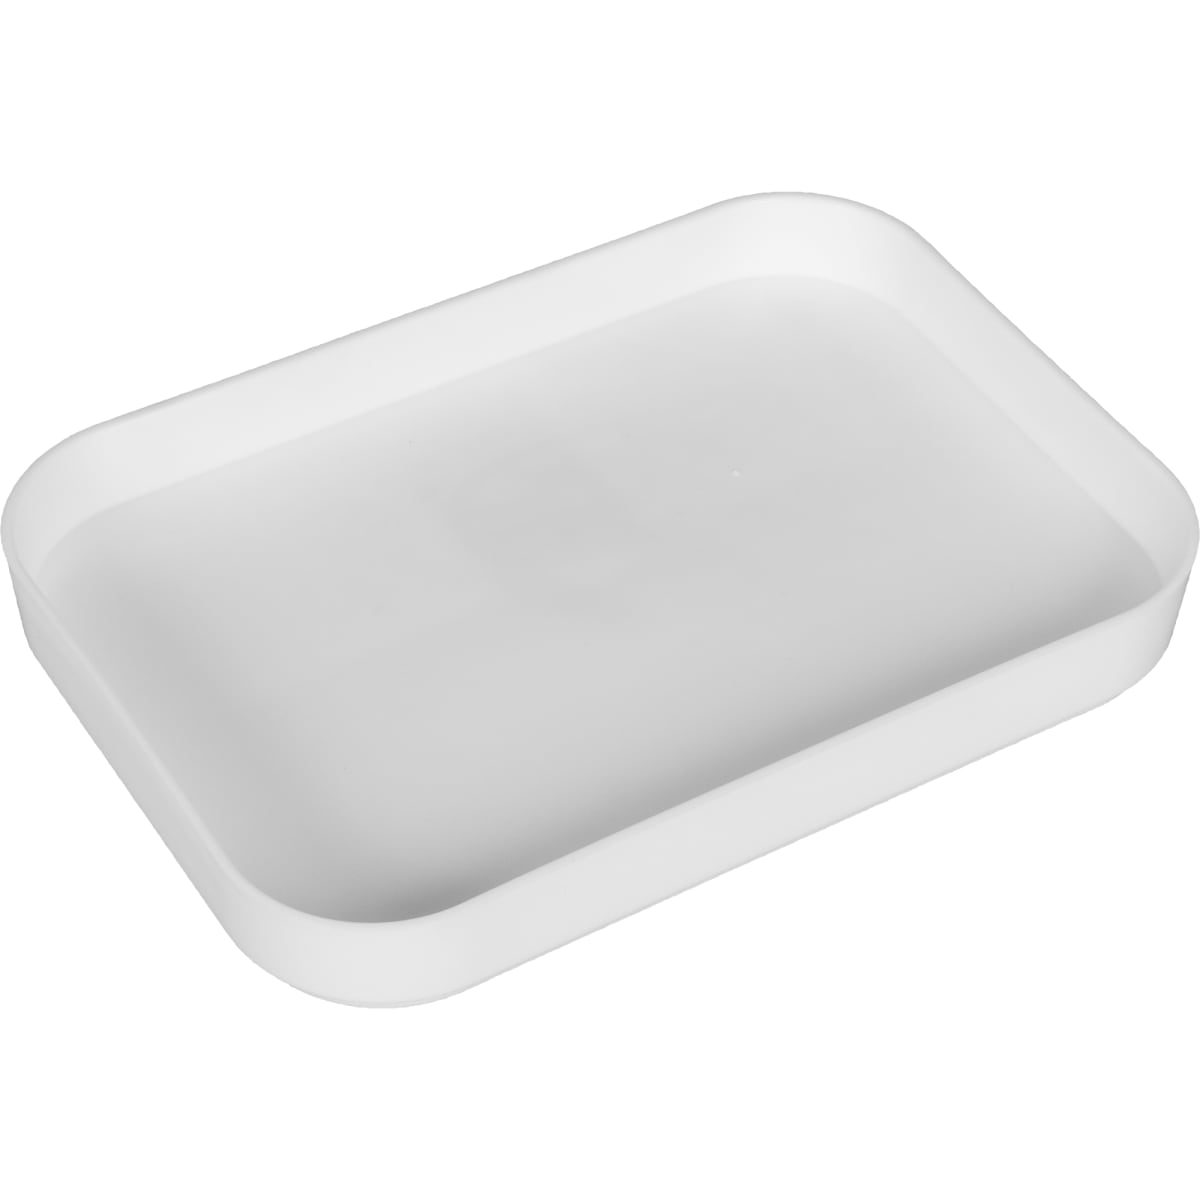 Крышка малая, 113x21x159 мм, пластик, цвет белый